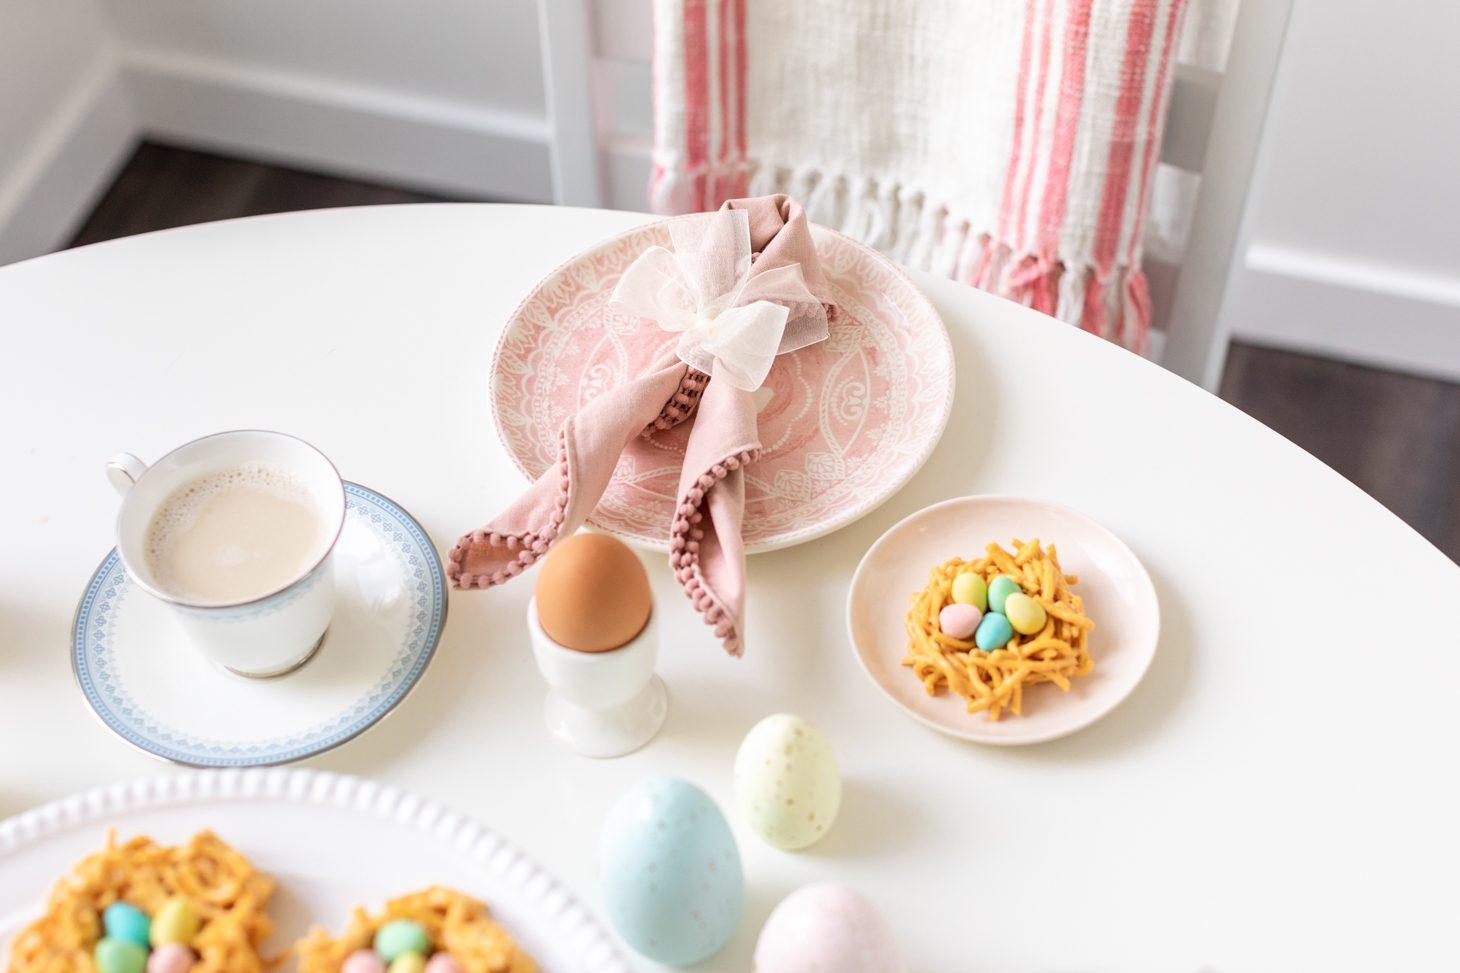 Easter Dinner Table Scape